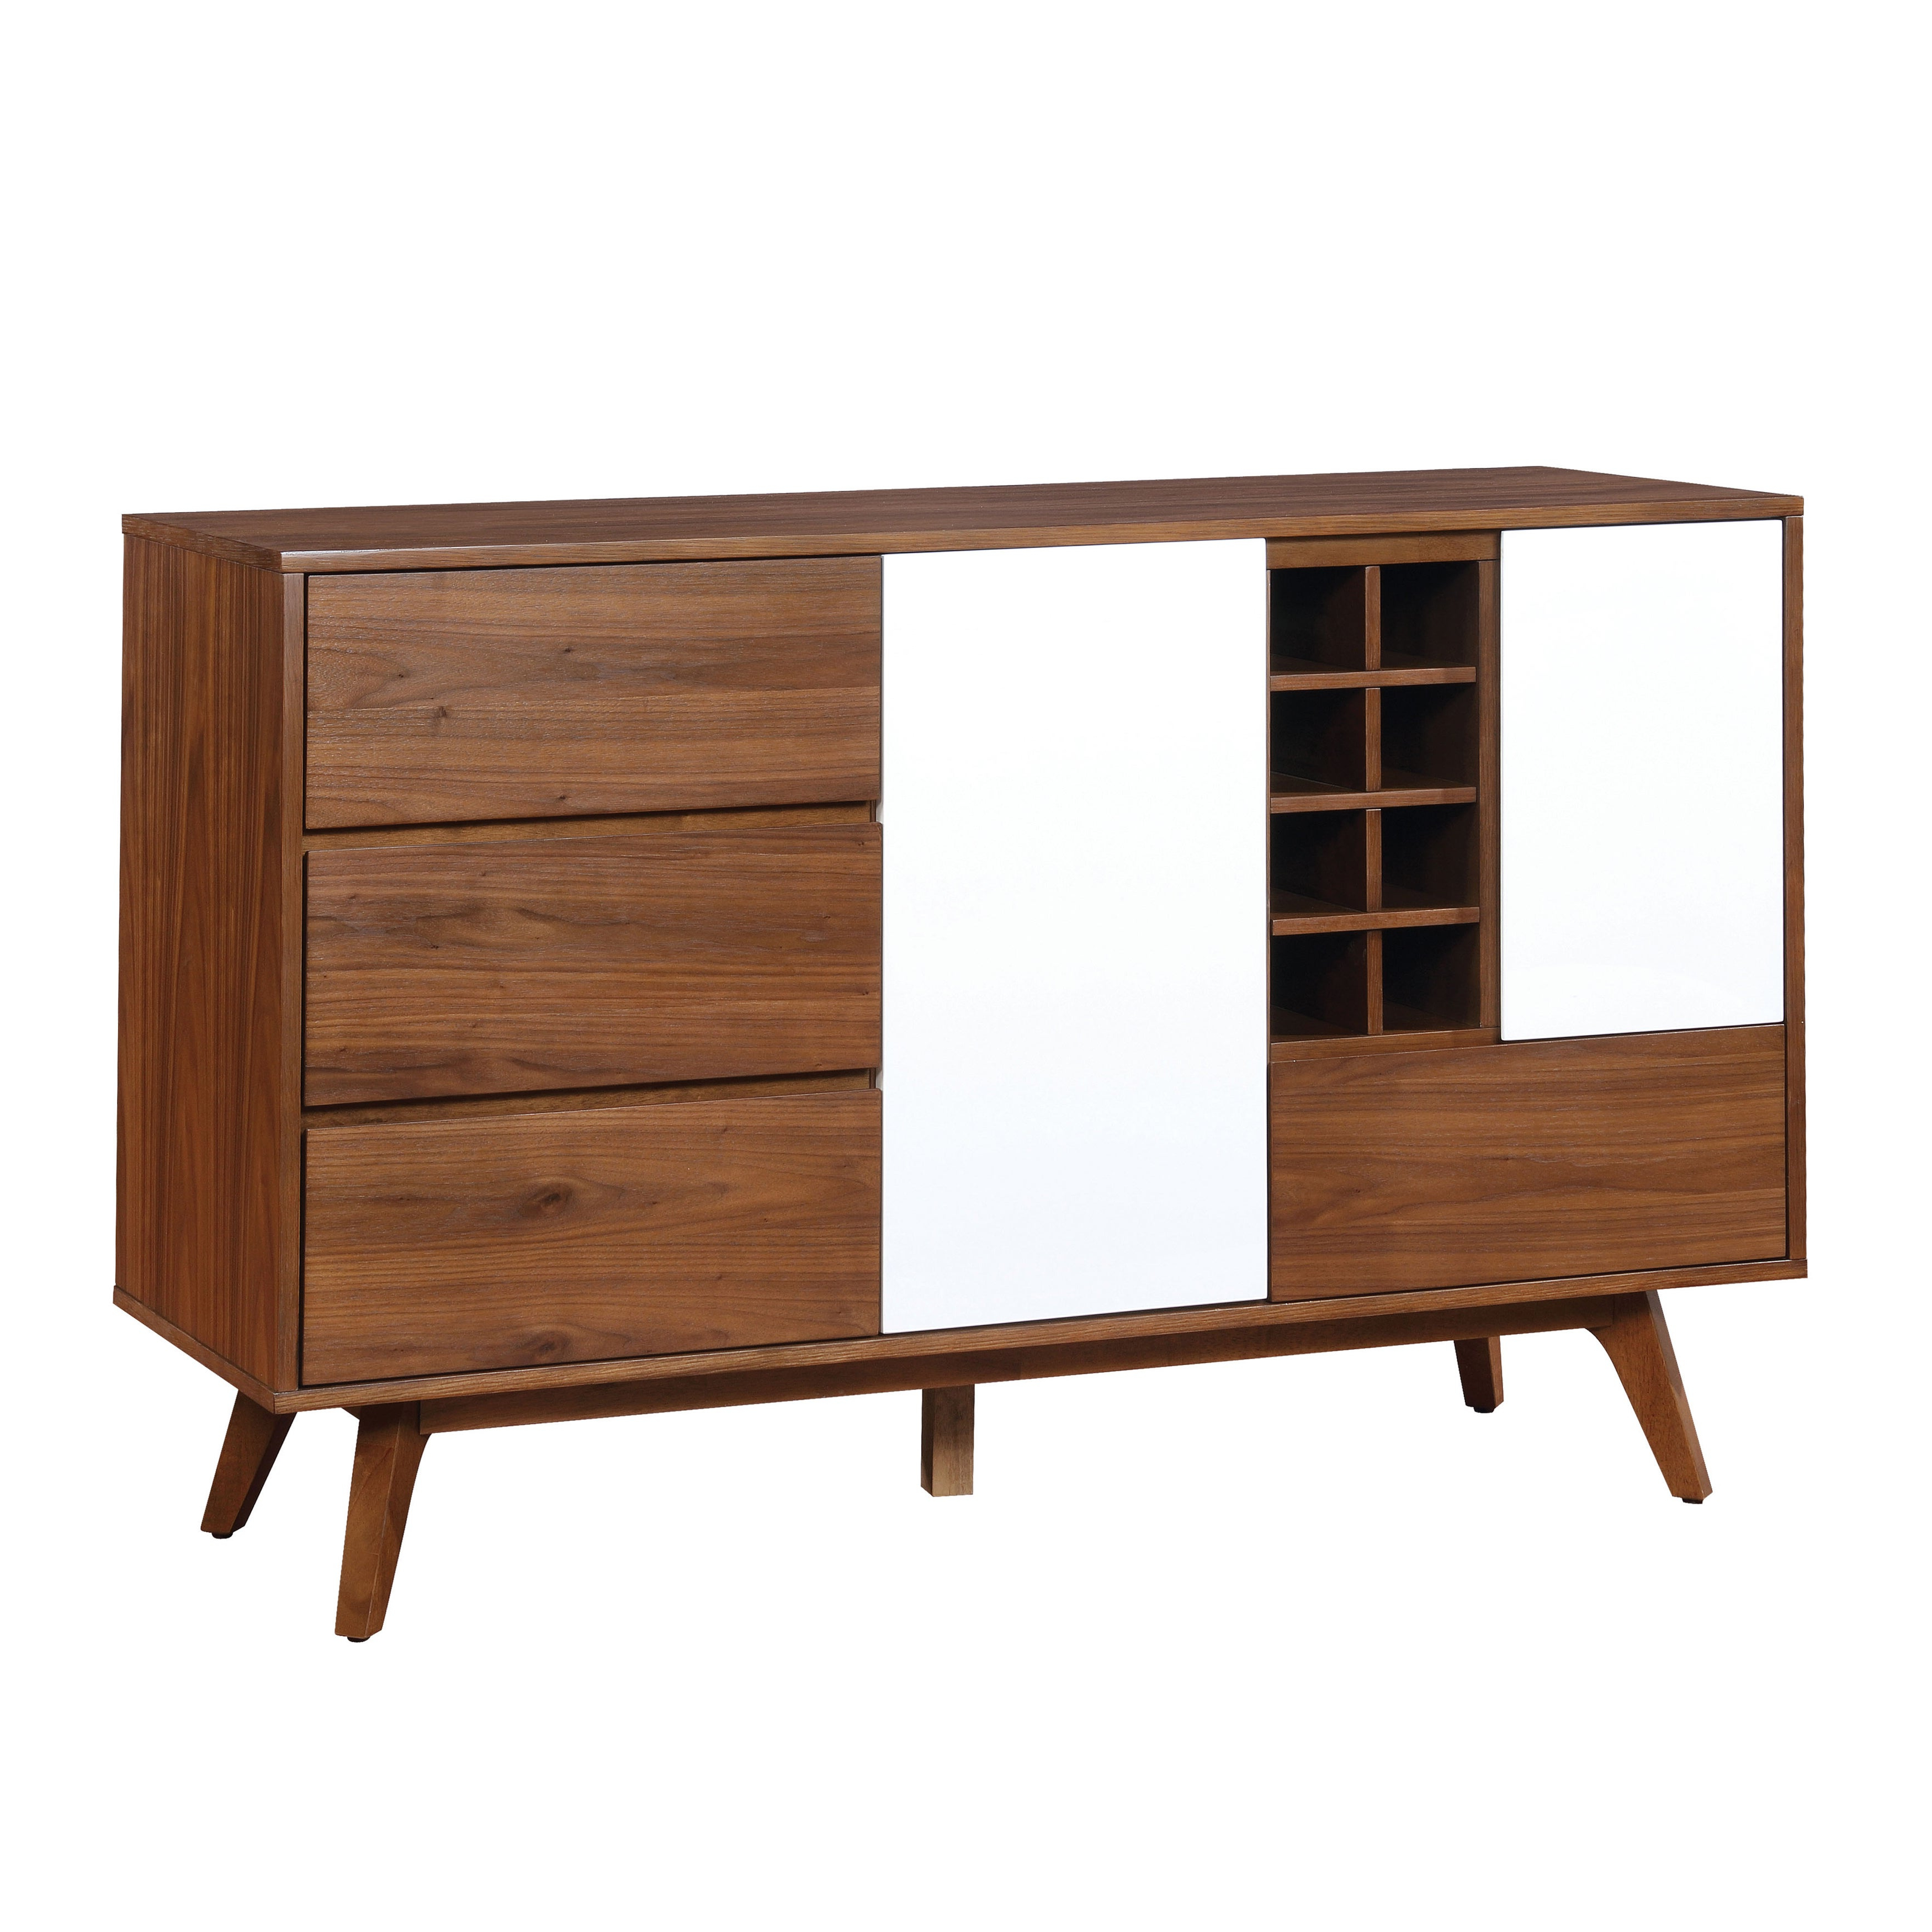 Furniture Of America Liman Mid Century Modern 2 Tone Oak/white Multi Storage Buffet/wine Cabinet Regarding Light White Oak Two Tone Modern Buffets (View 2 of 20)